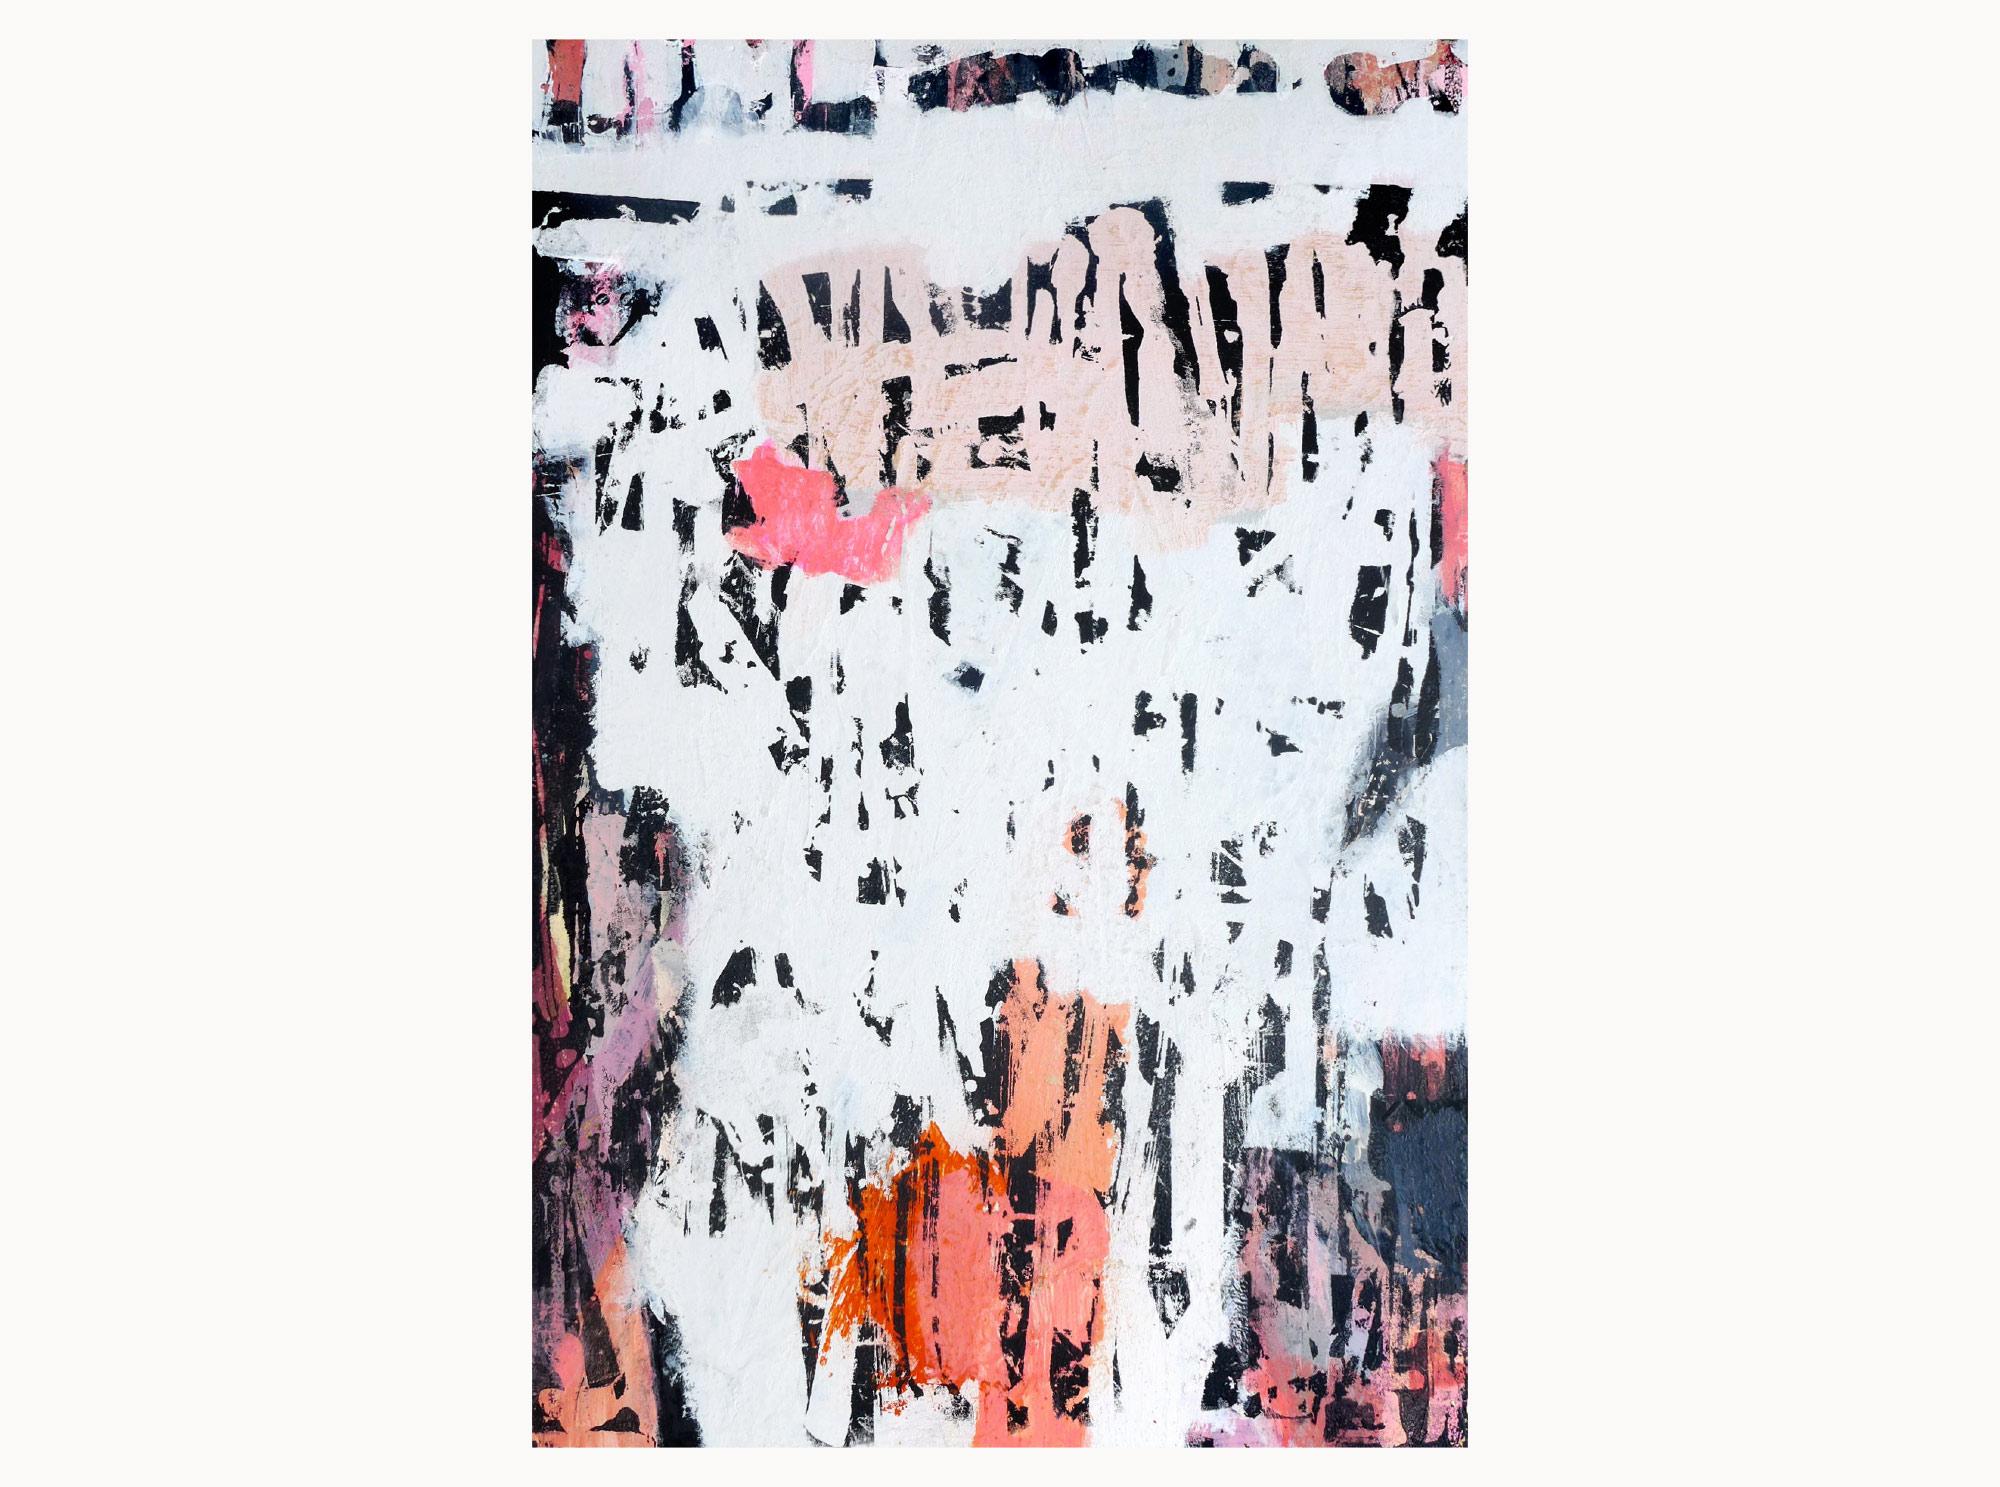 Faded,  2019, acrylic, plywood, 40 x 60 cm